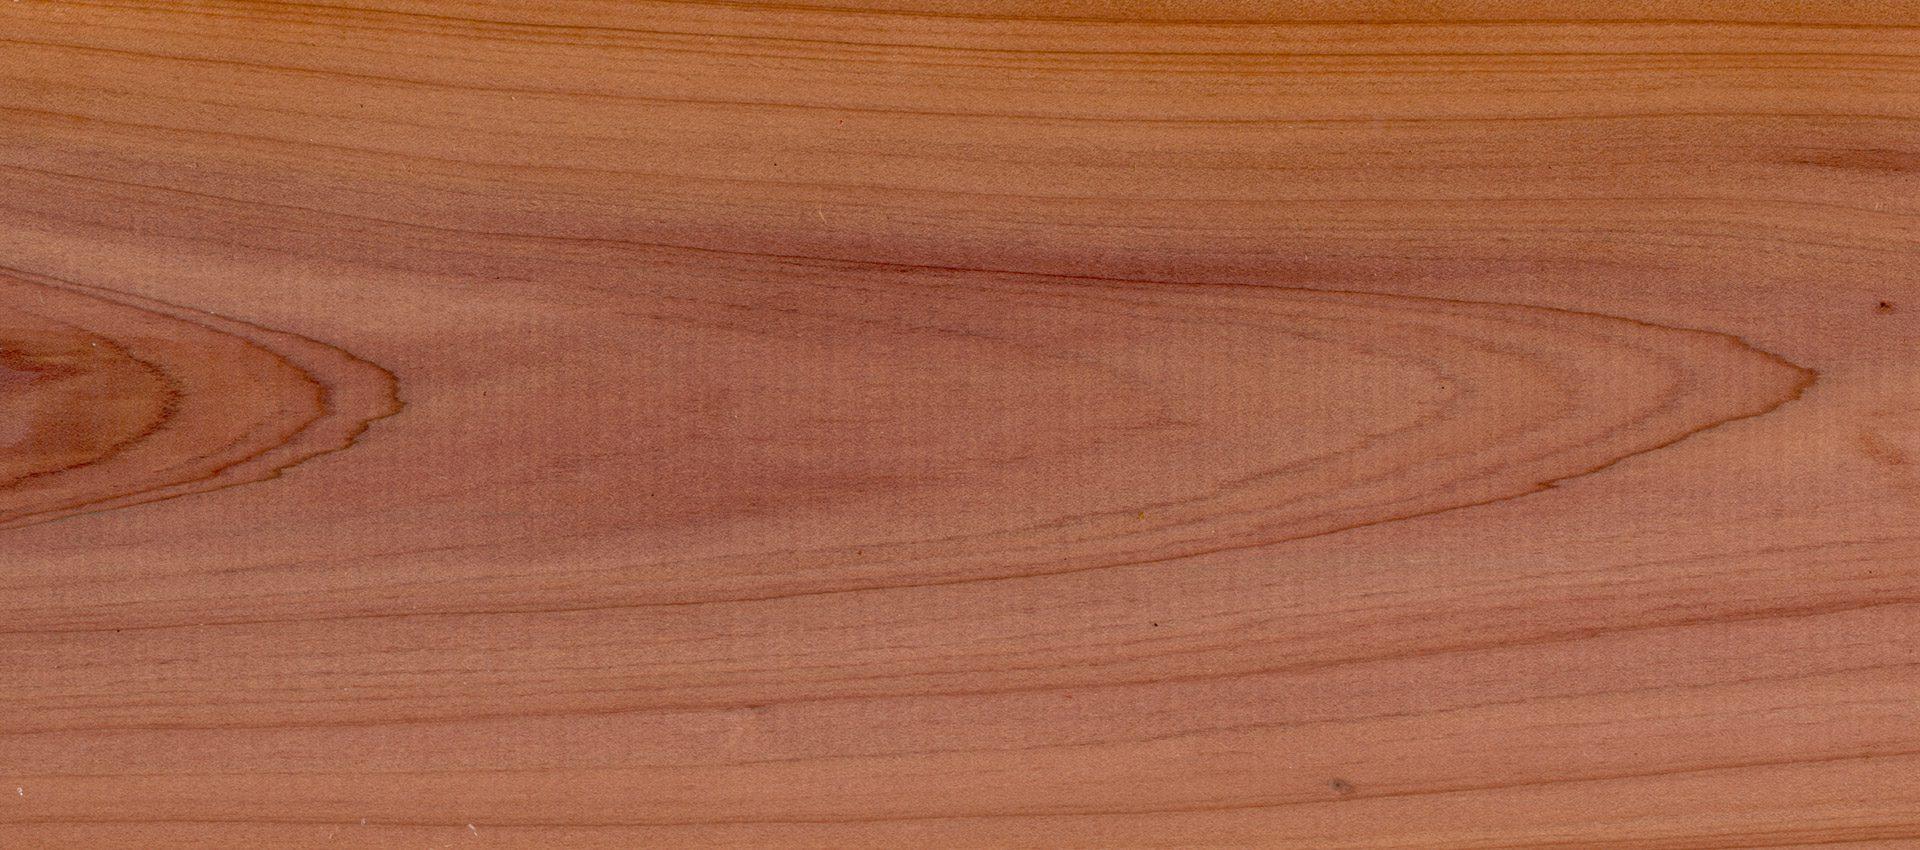 Western Red Cedar Lumber   Western Red Cedar Wood   Western Red Cedar Boards   Cedar Distributor